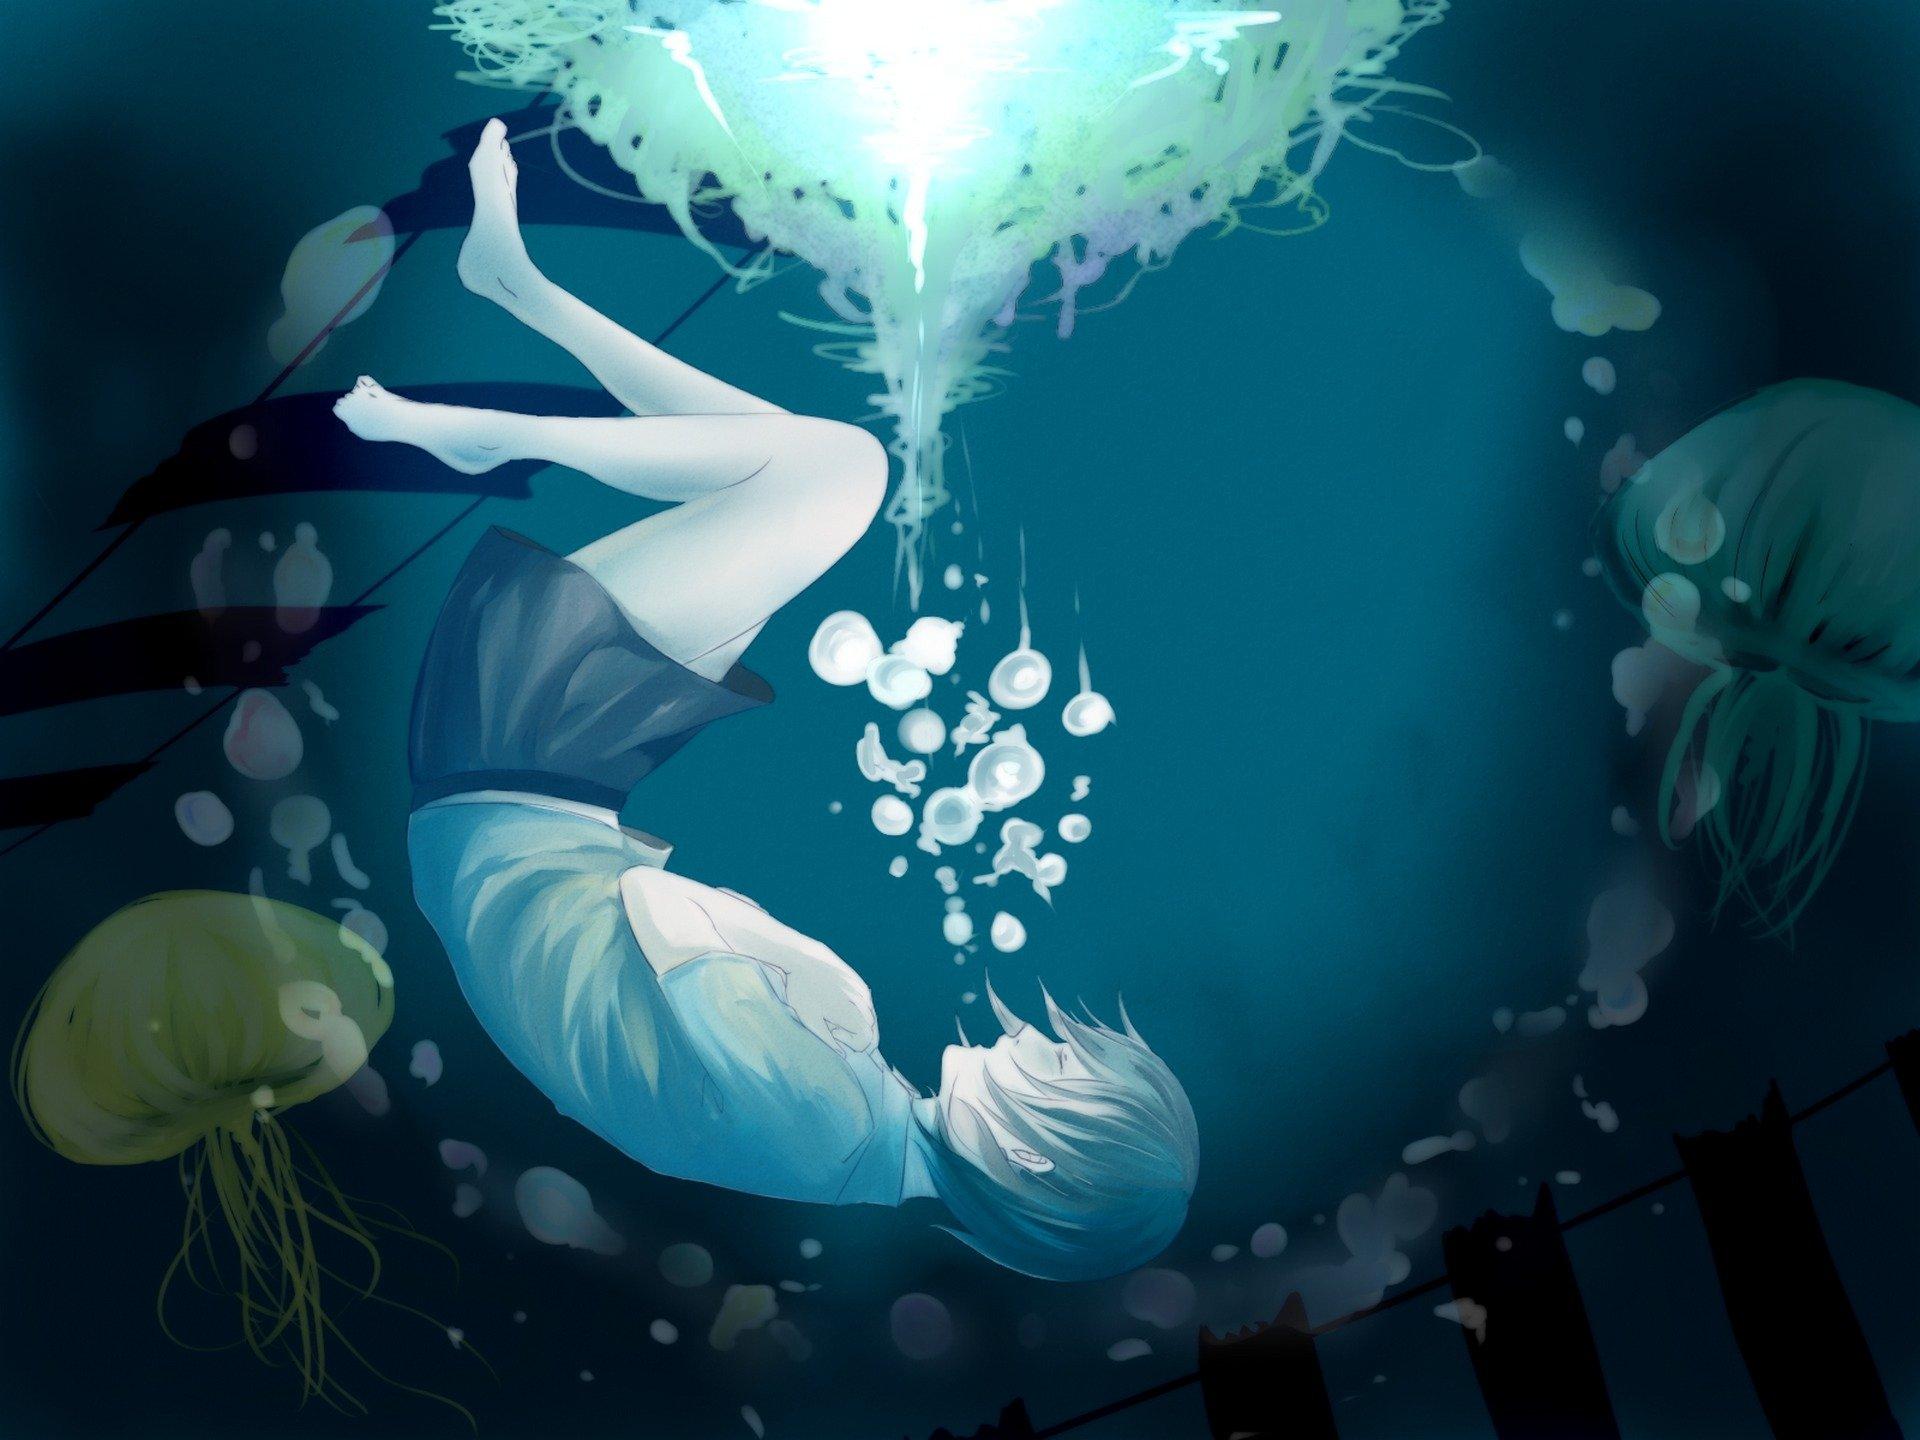 Pin by reema uoo on Anime boy | Anime scenery, Fantasy